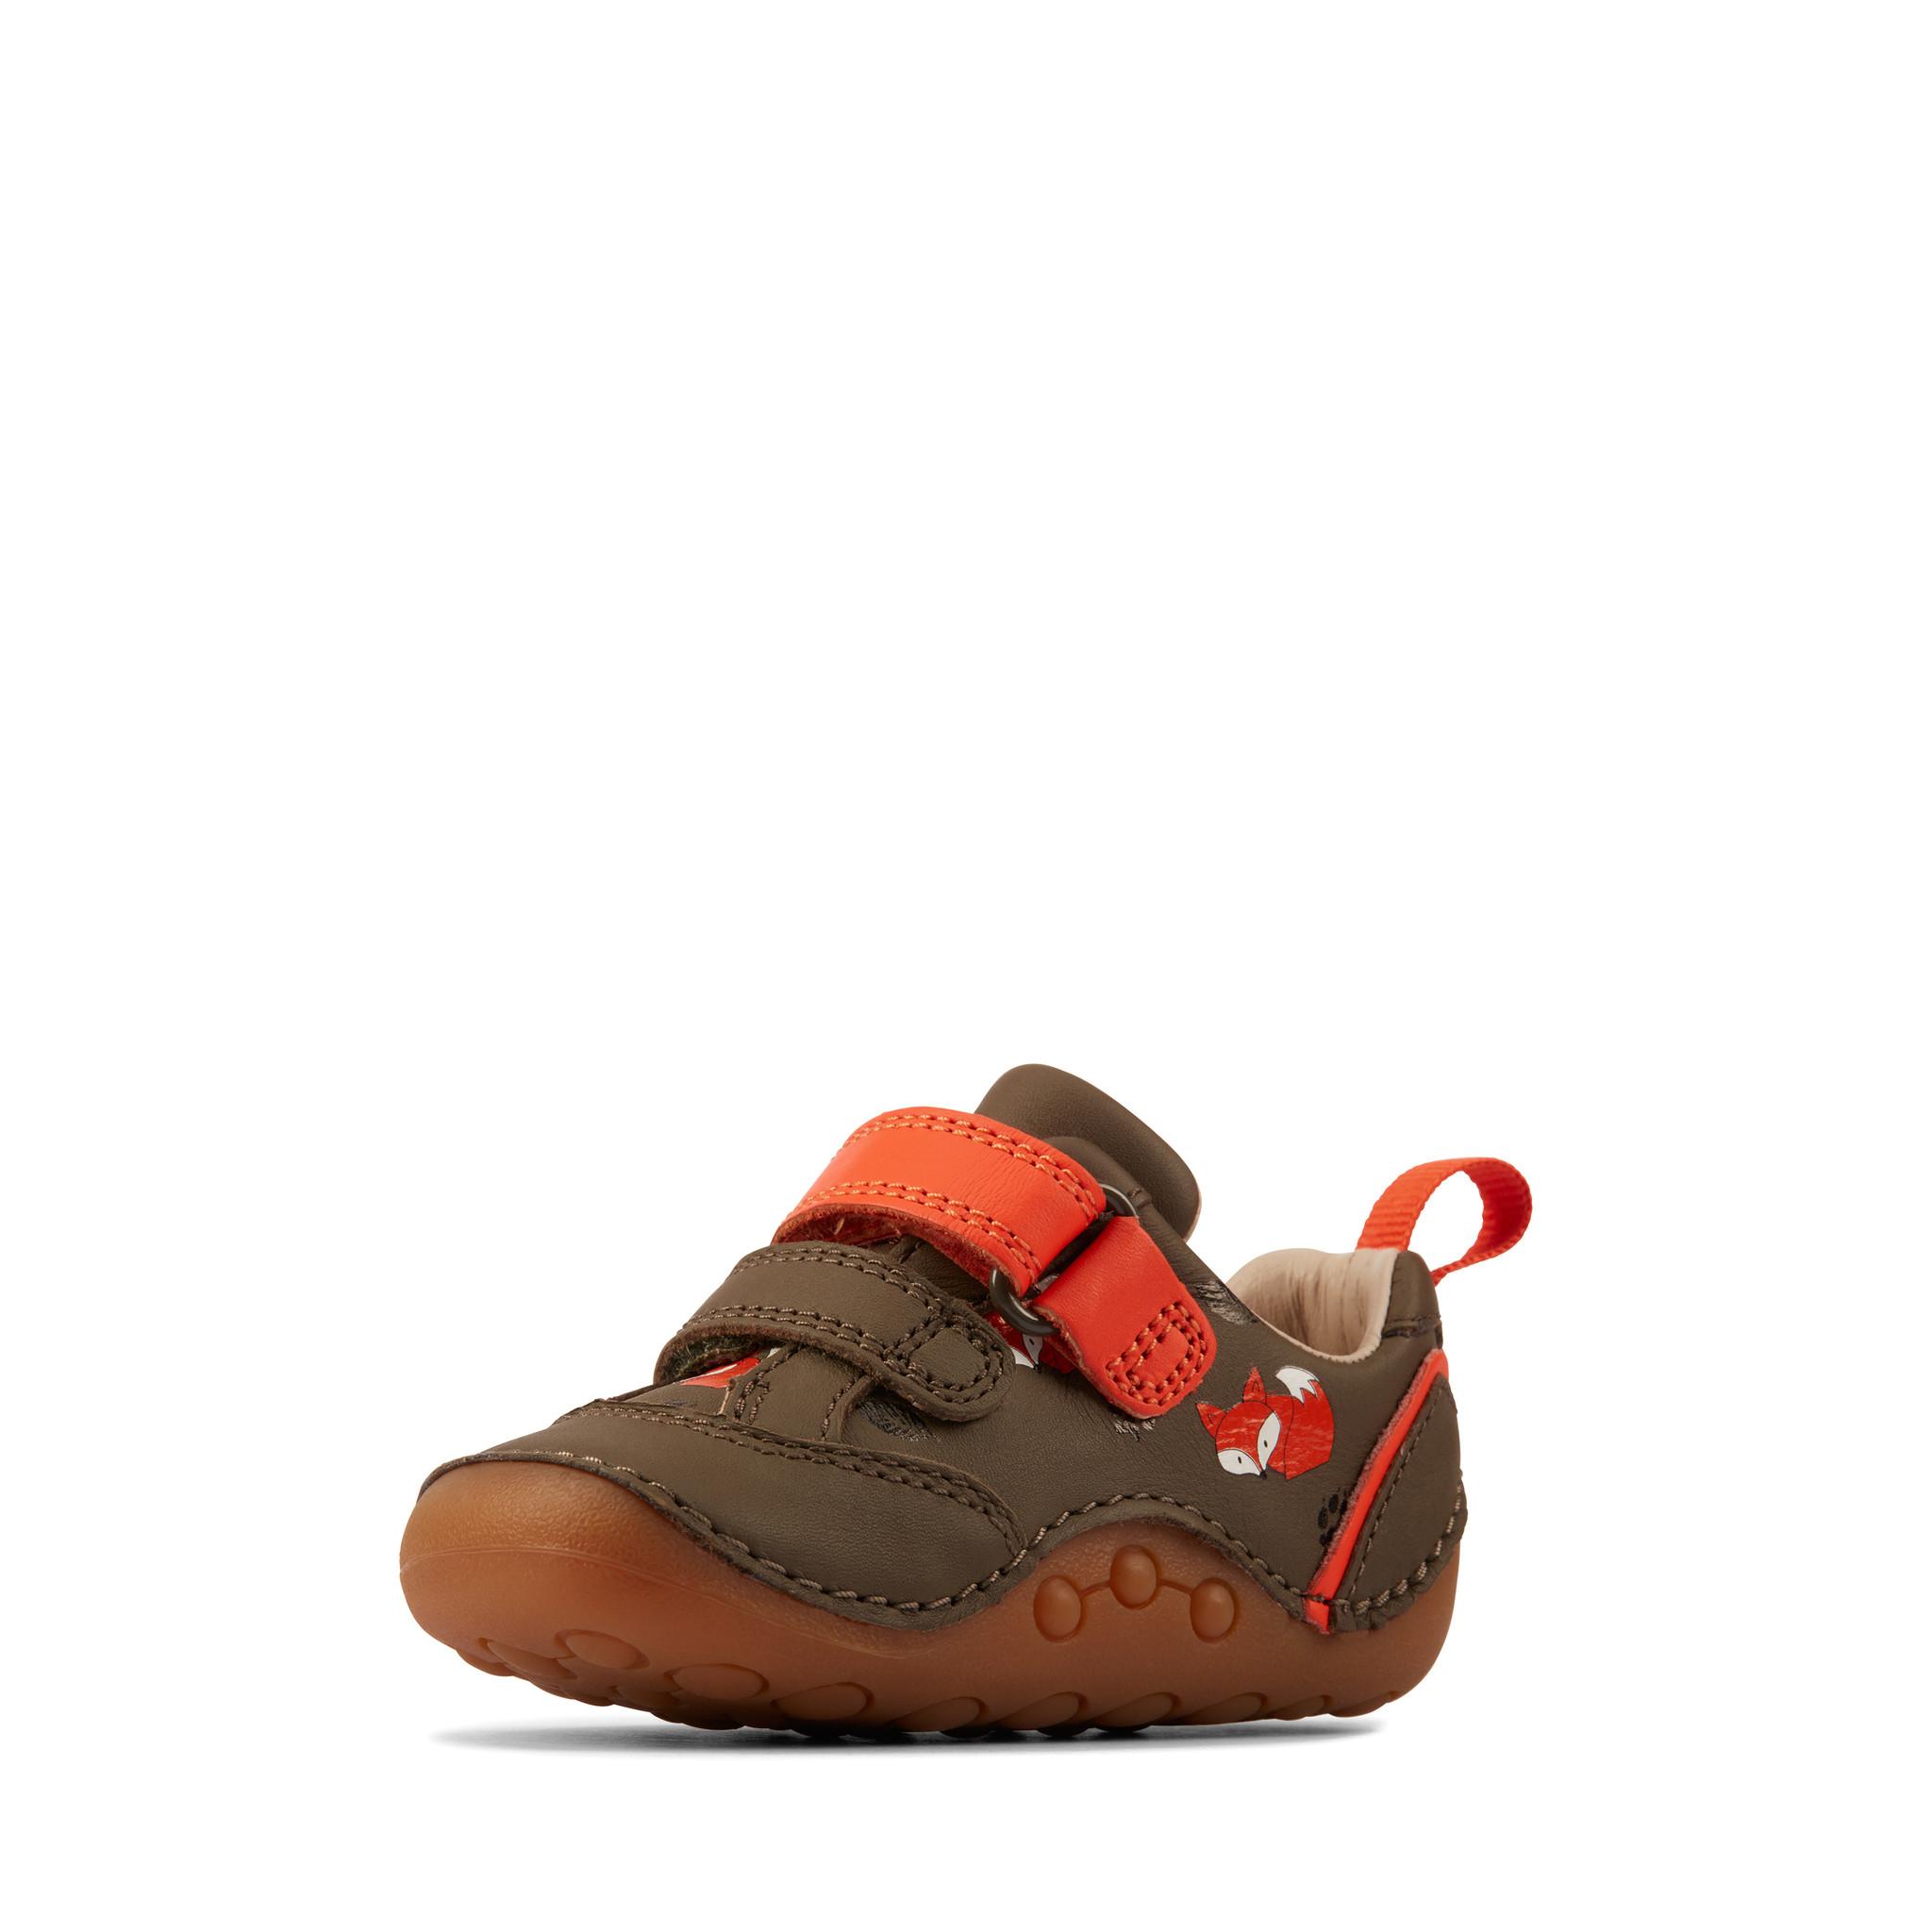 Clarks Tiny Cub Khaki Leather